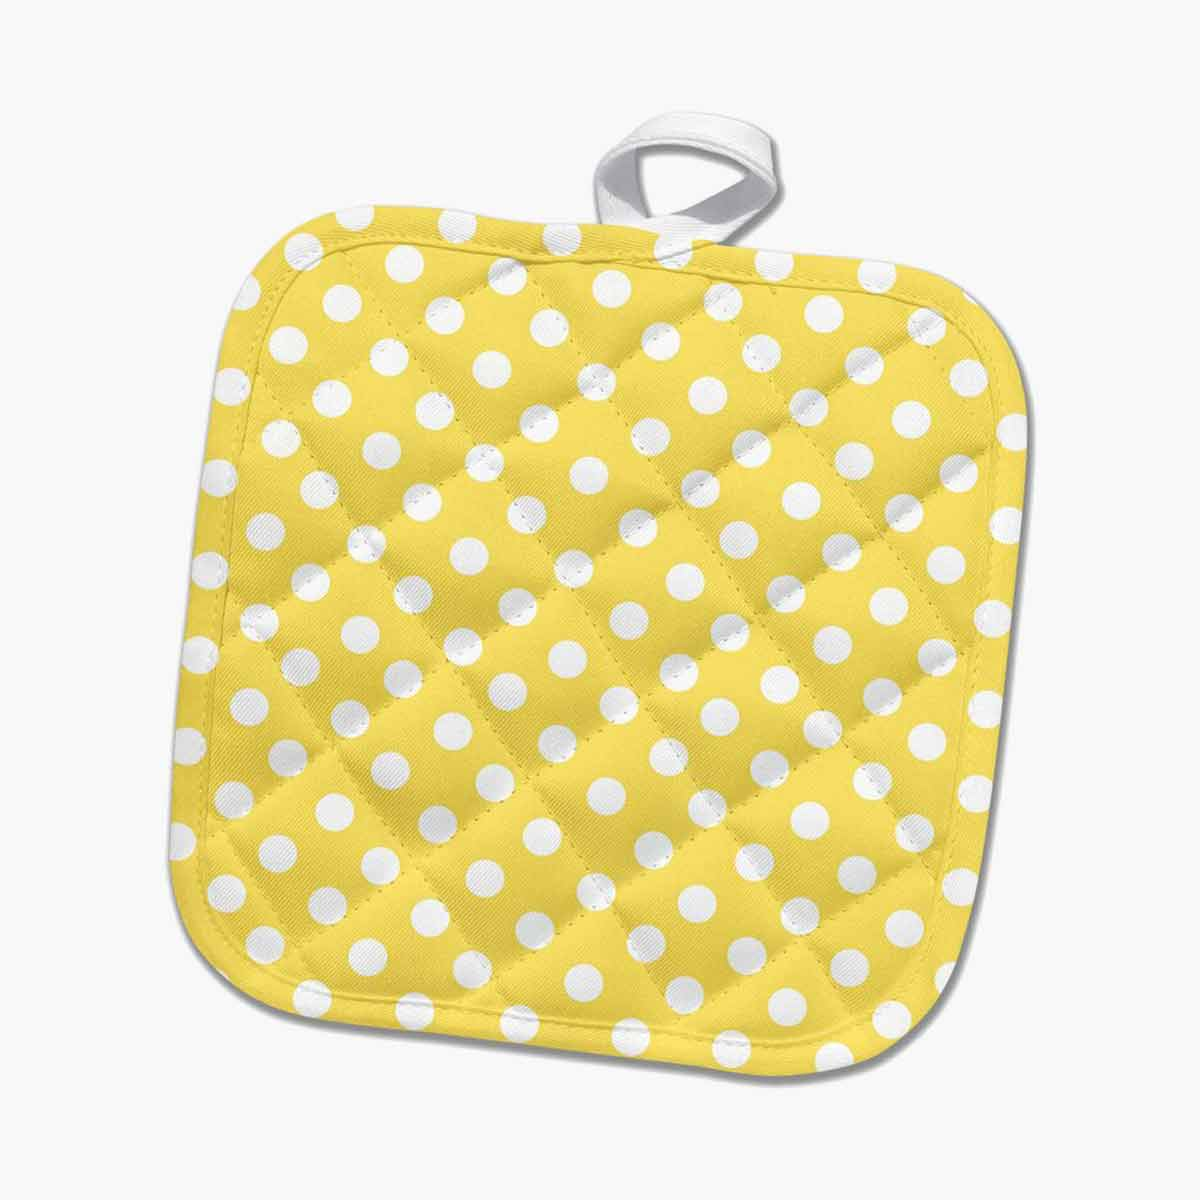 Yellow and white polka dot pot holder.